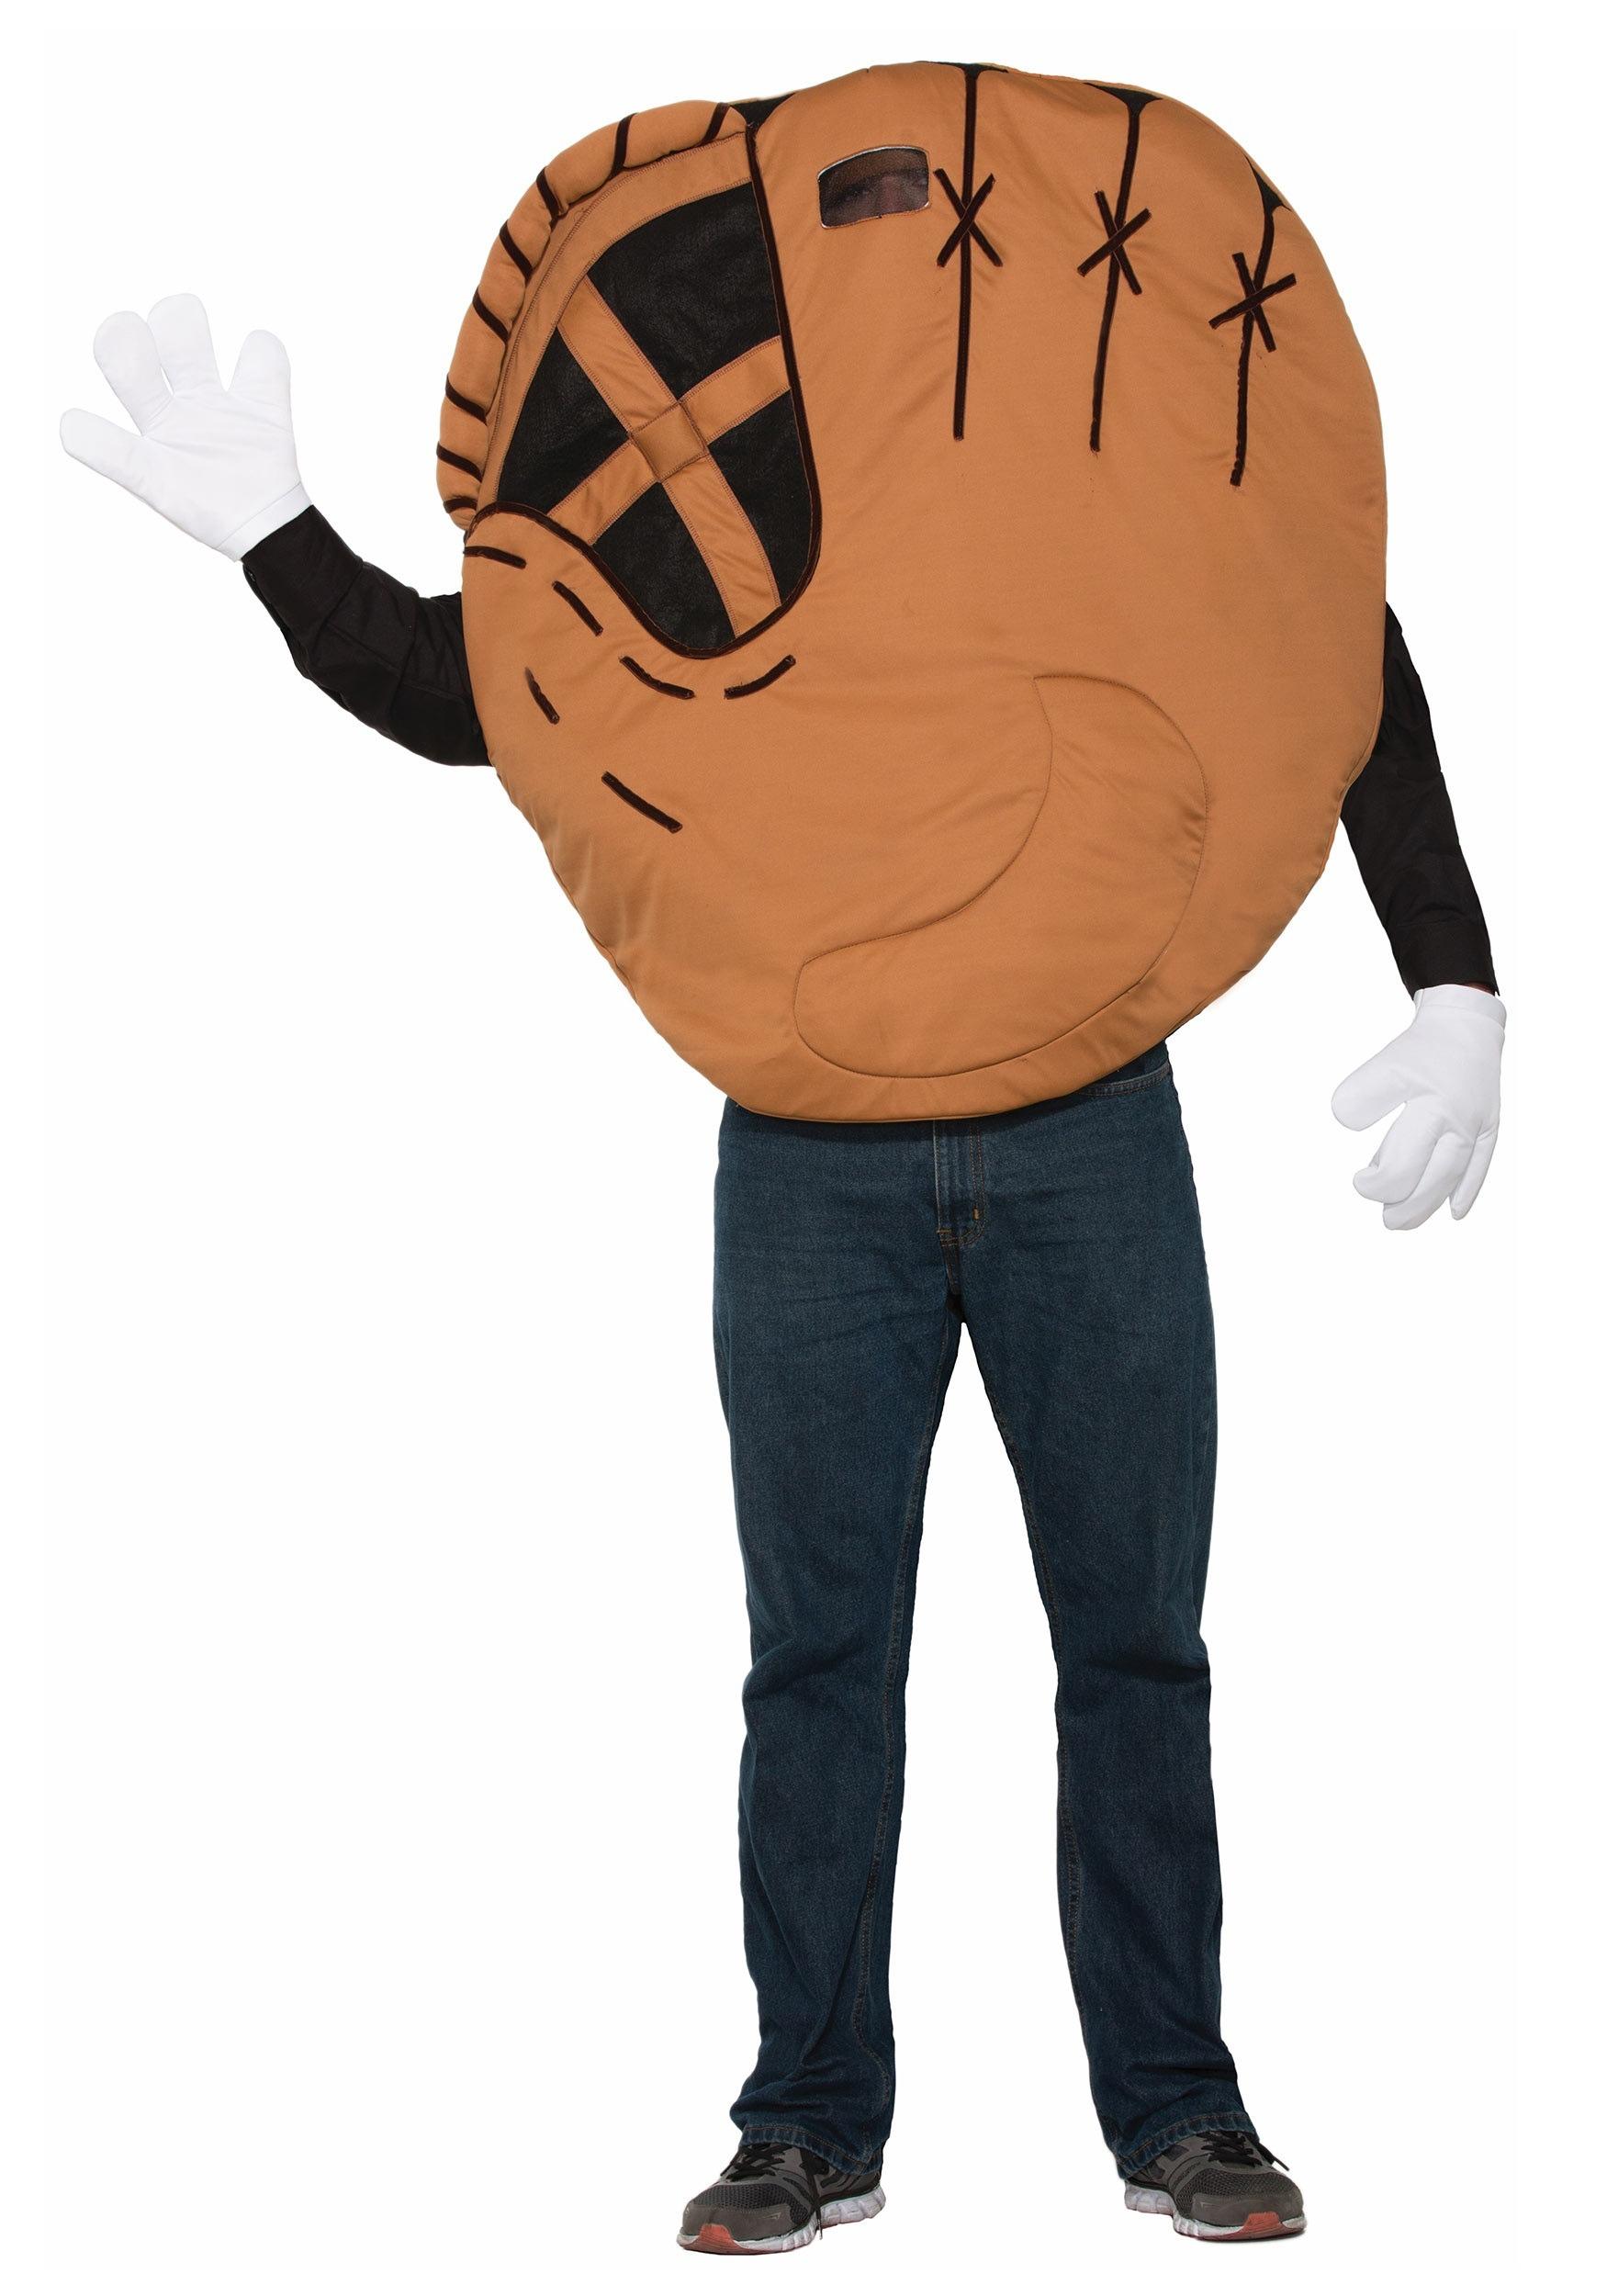 sc 1 st  Halloween Costumes & Adult Baseball Mitt Costume